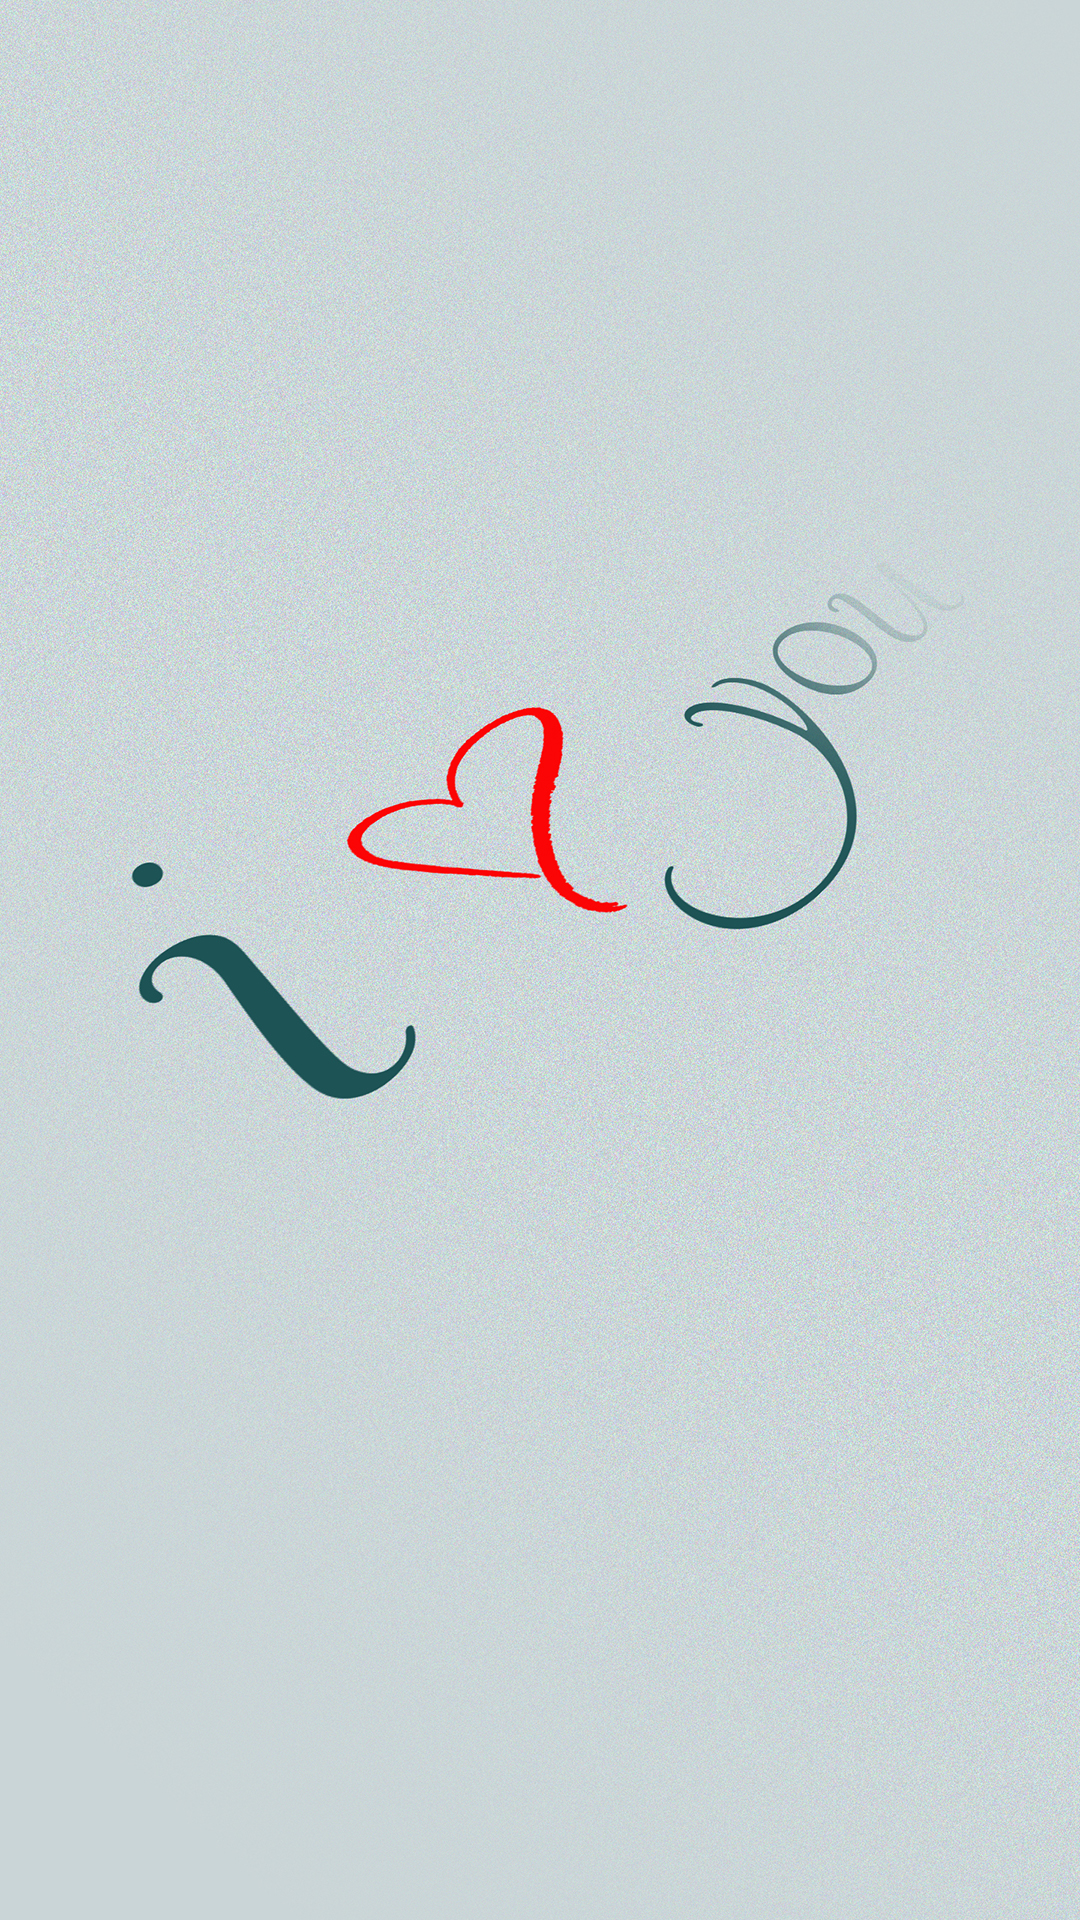 cute love wallpapers iphone 6s pluslirking20 on deviantart